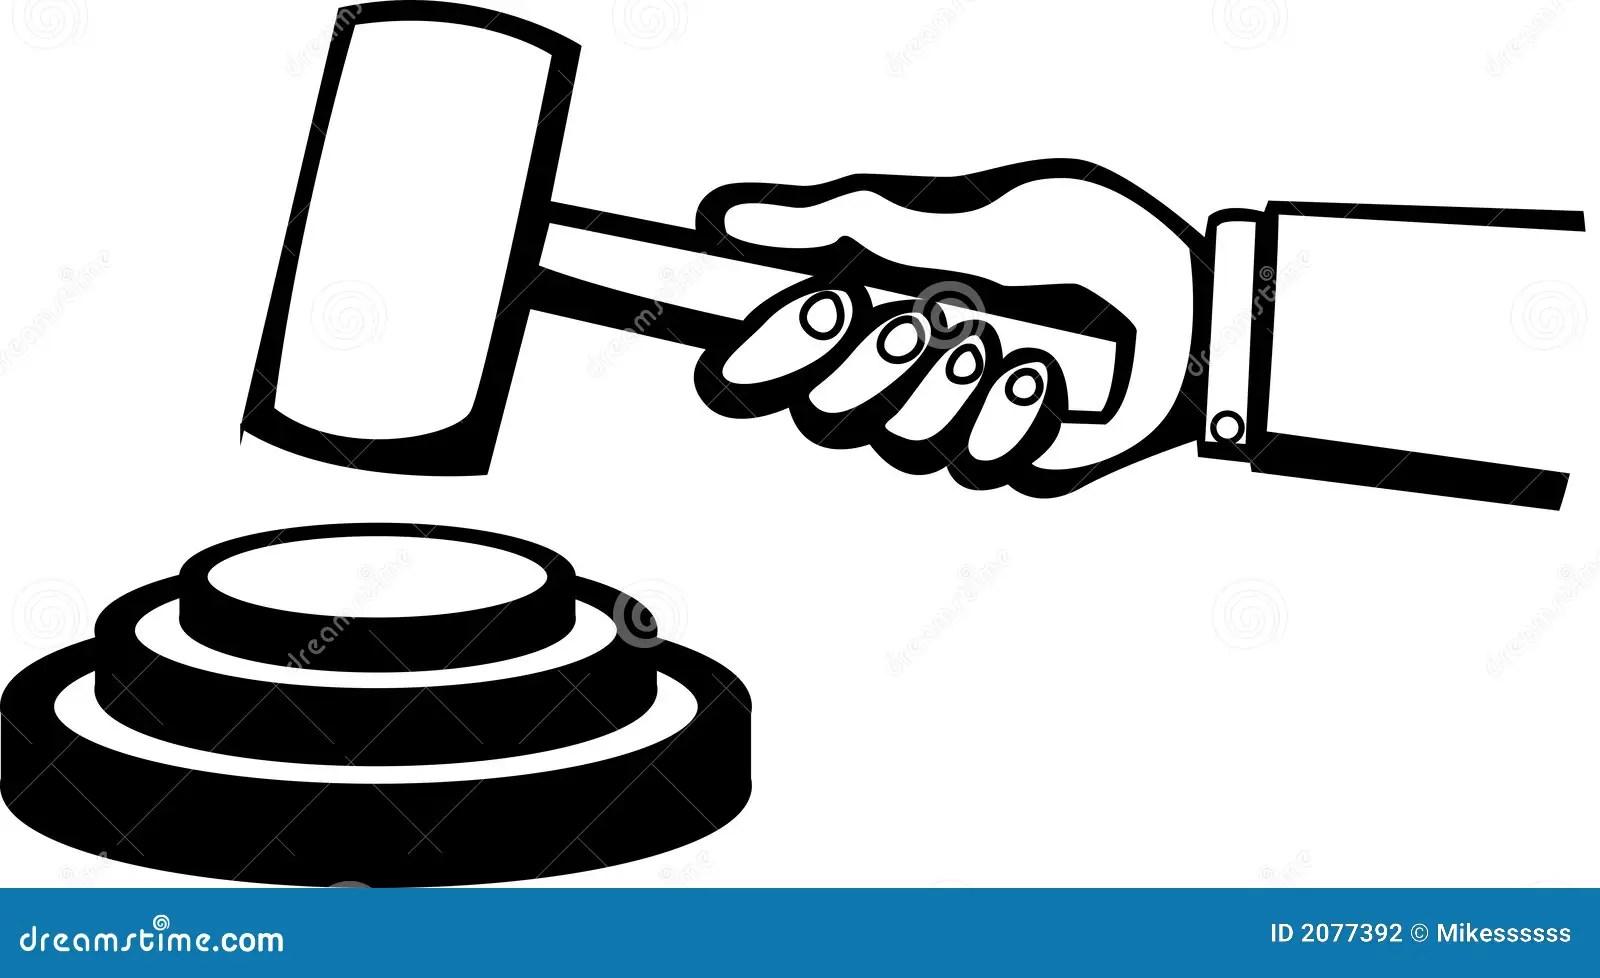 Judge Or Auction Hammer Vector Illustration Stock Vector